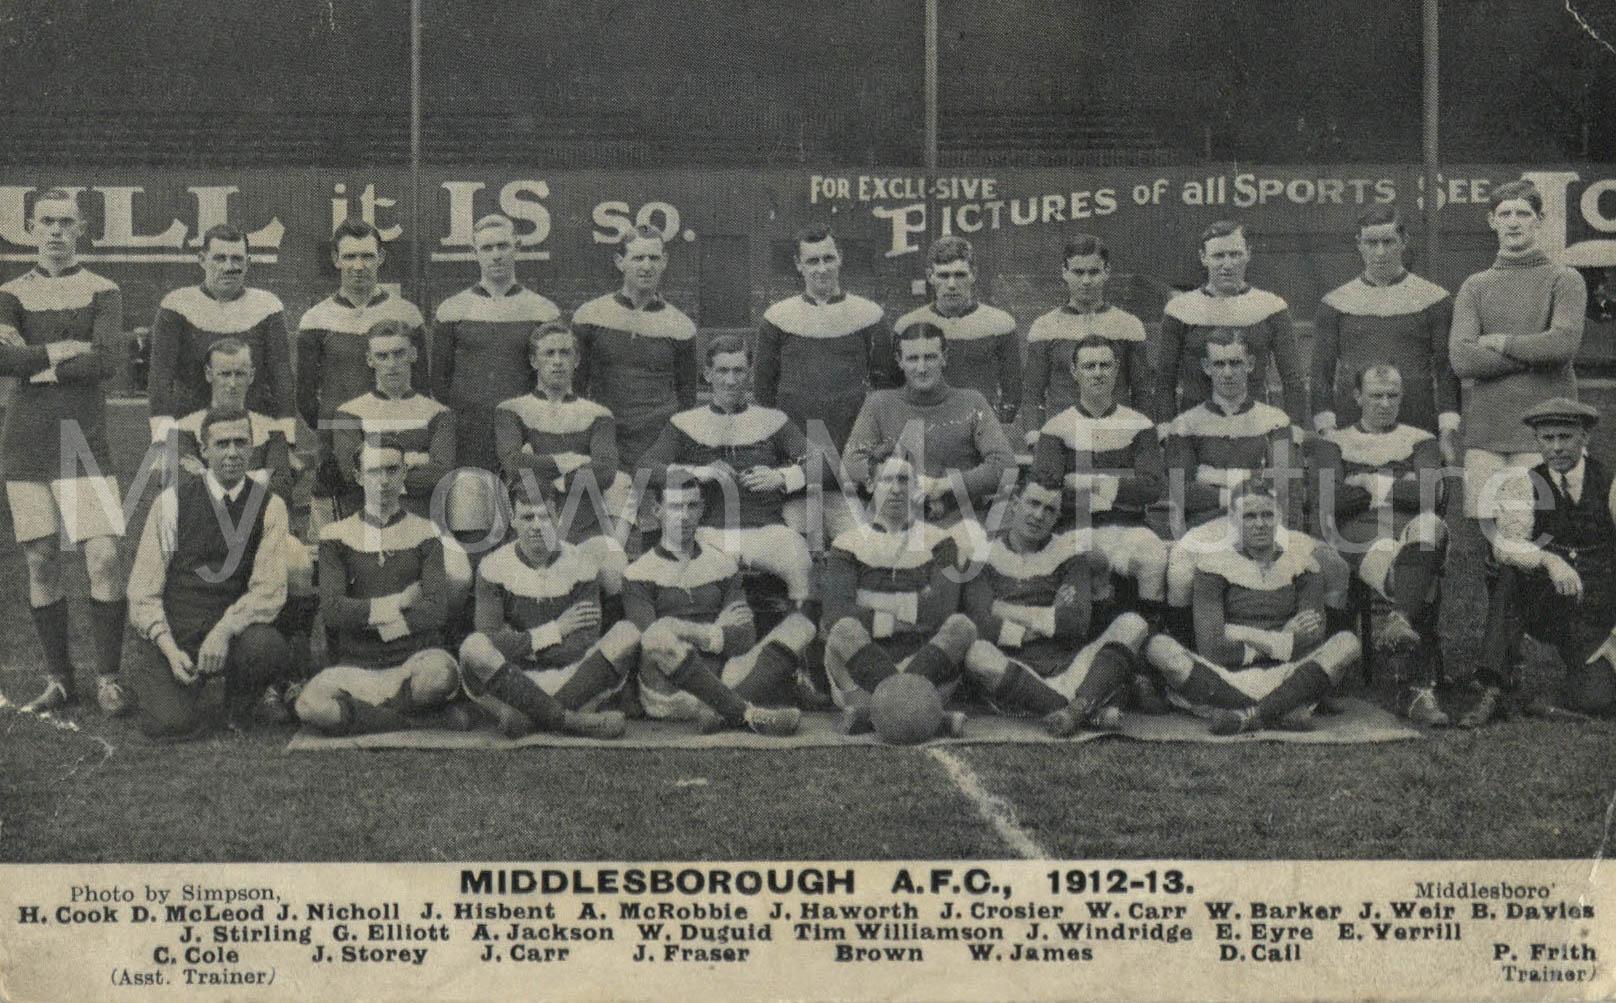 Middlesbrough Football Club 1912-1913